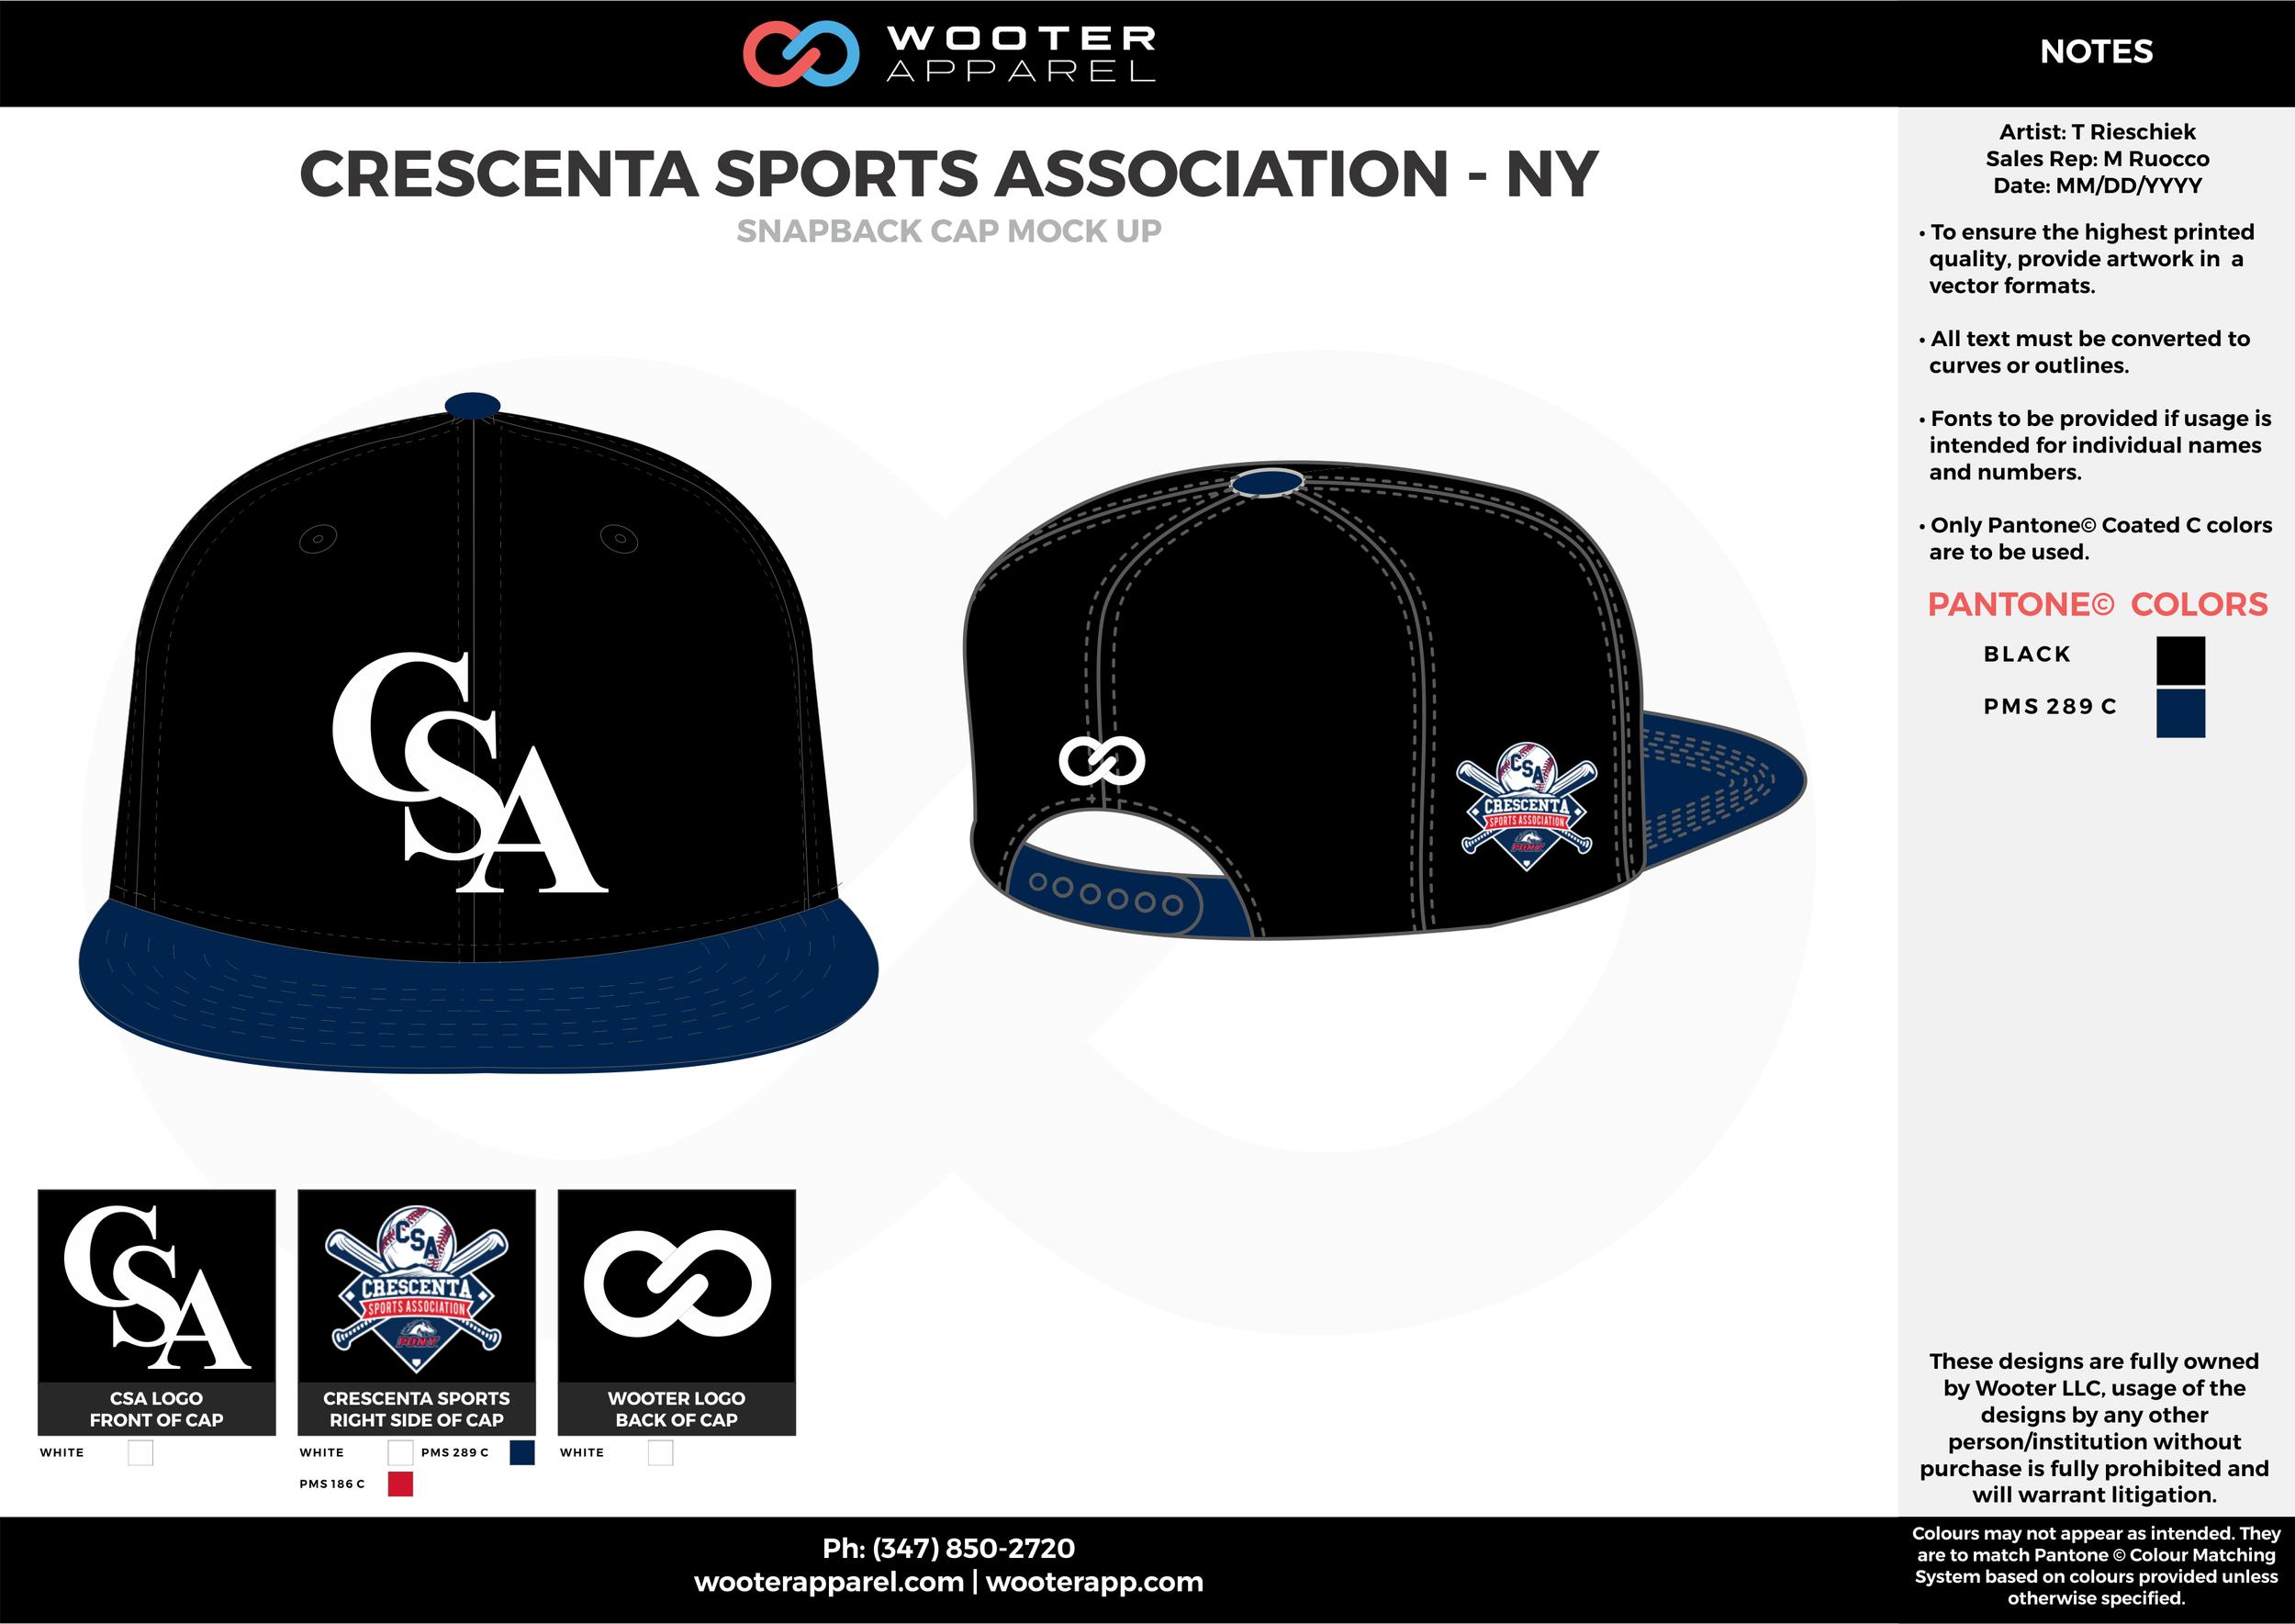 CRESCENTA SPORTS ASSOCIATION - NY Black Blue and White Basketball Snapback Hat and Cap